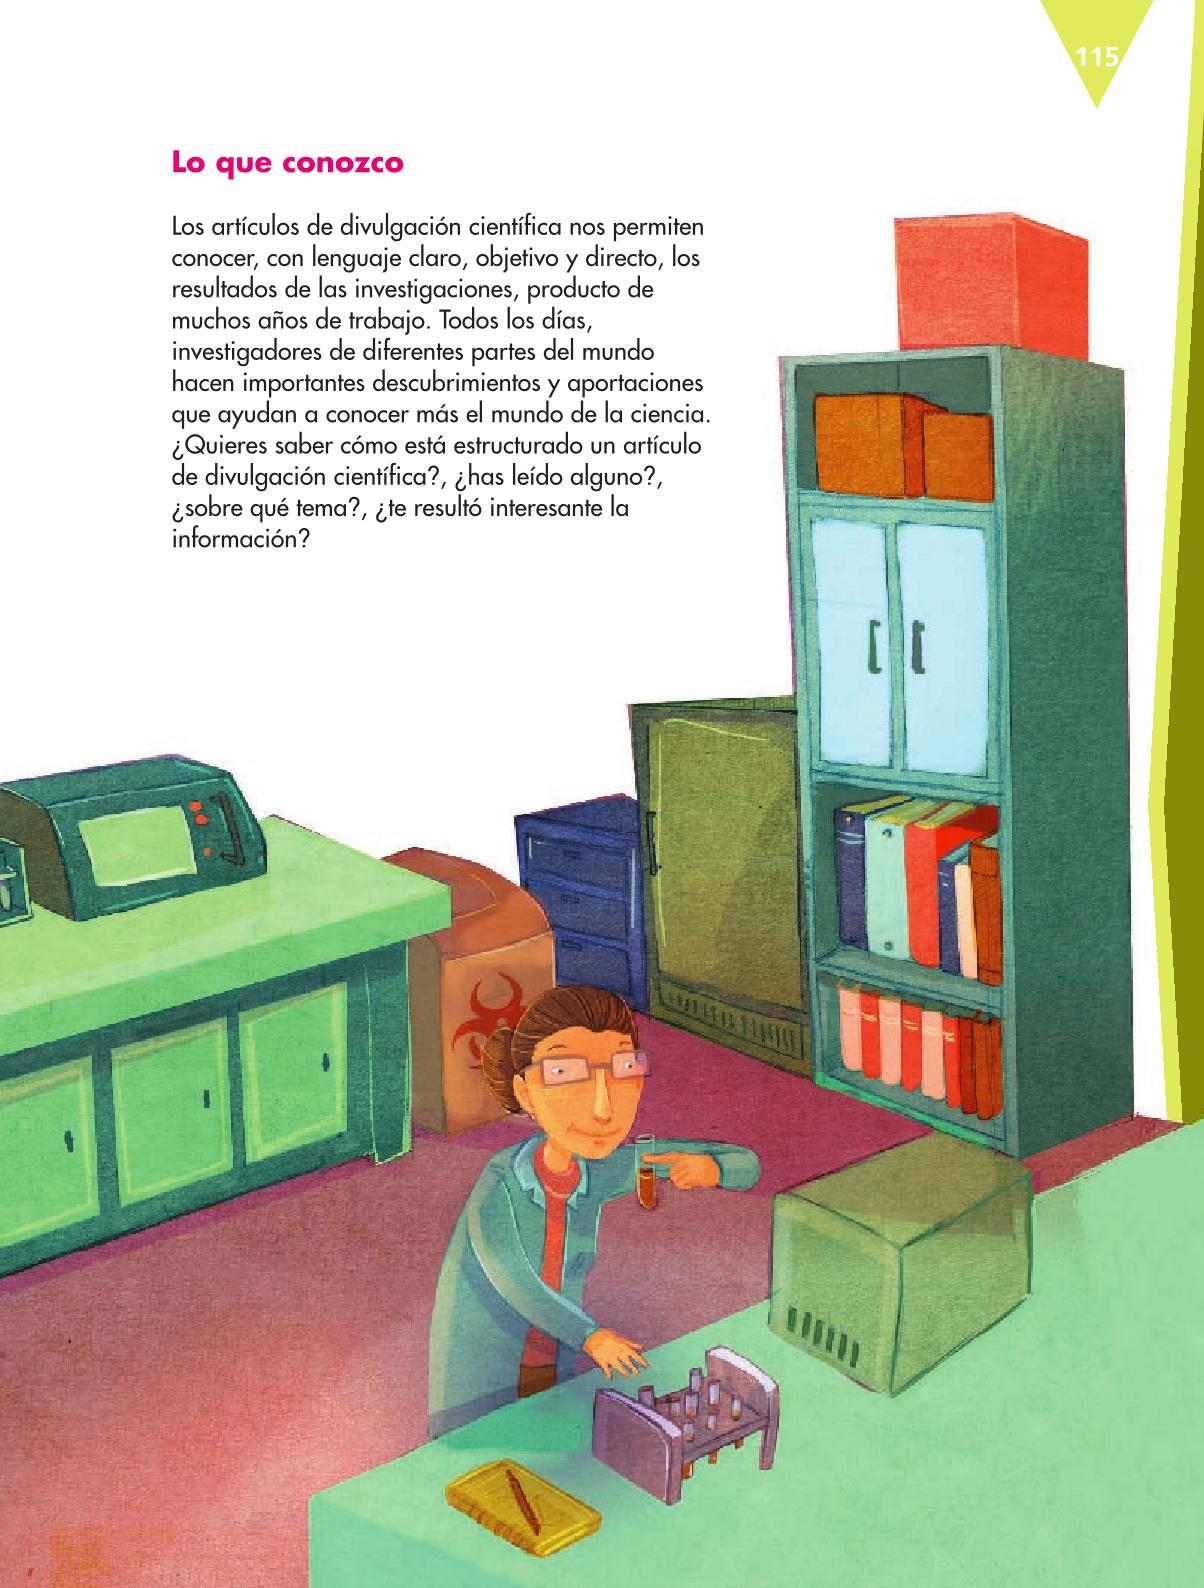 Español Libro para el alumnoquintoPagina 115